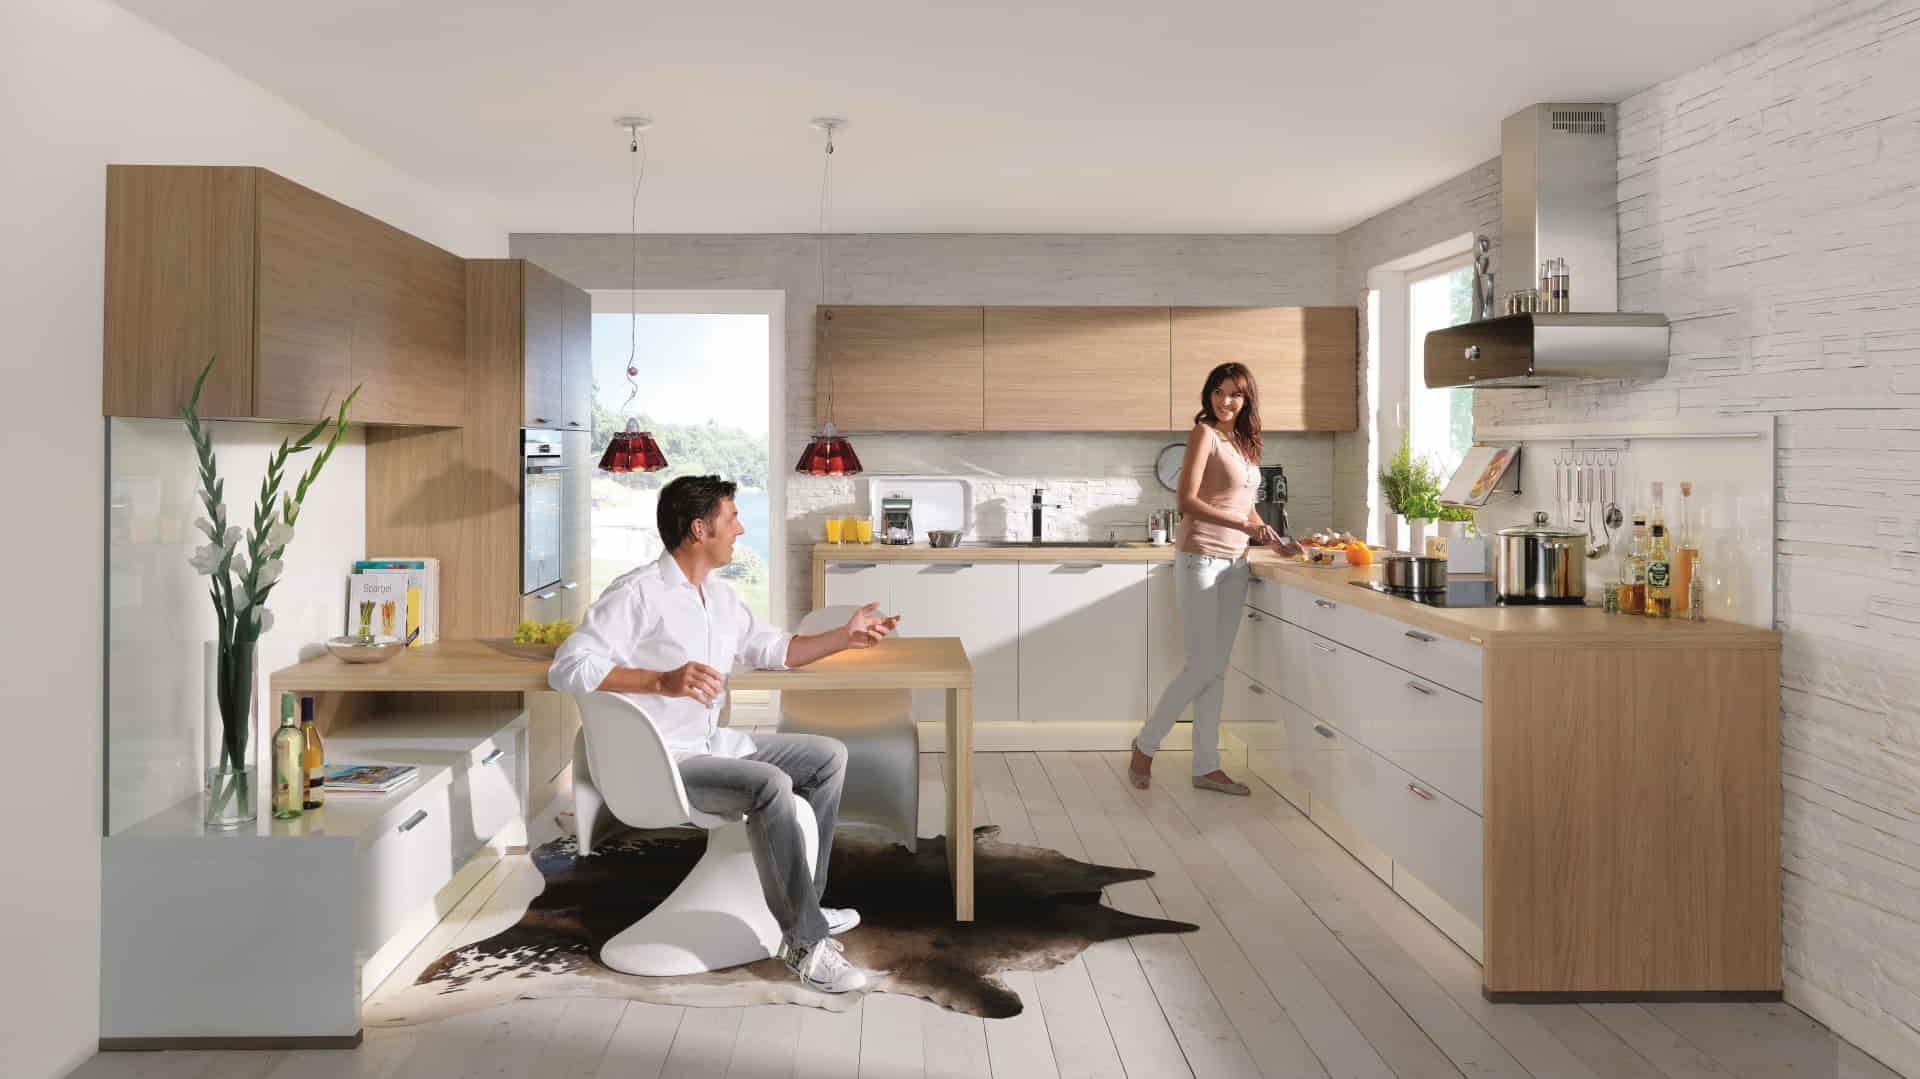 Vinyl Plank Flooring For Kitchen